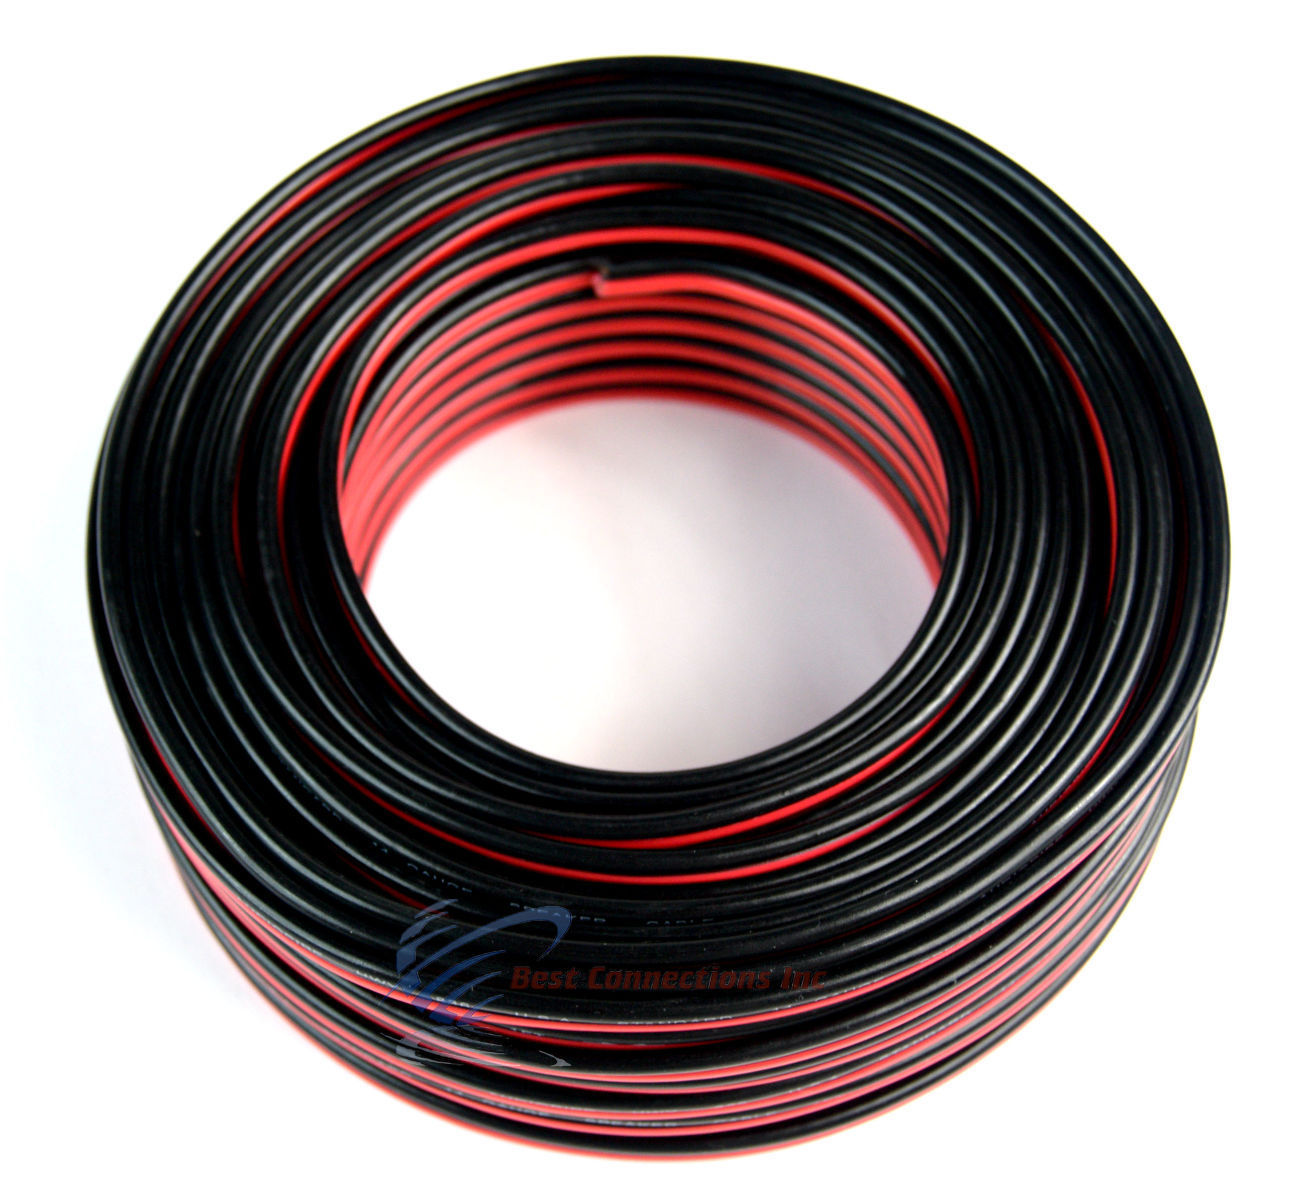 Audiopipe 100 Ft 14 Gauge Red Black Stranded 2 Conductor